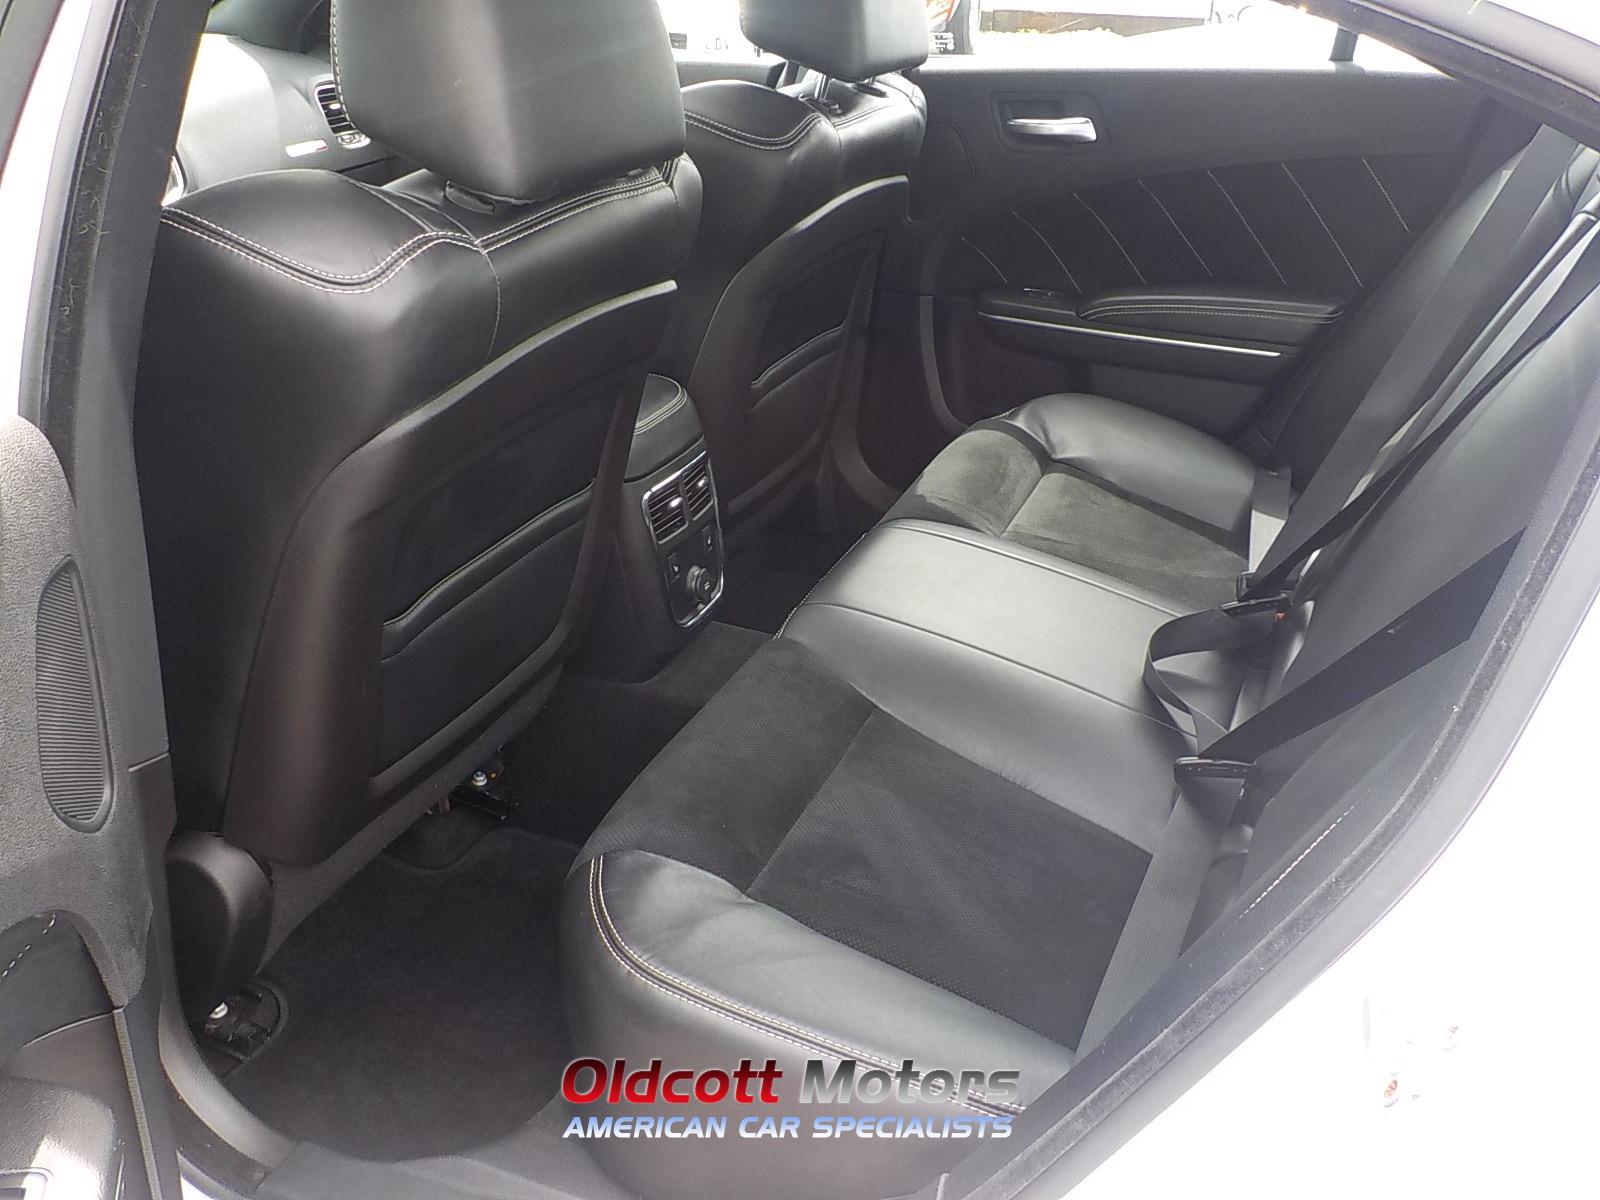 2013 Dodge Charger Pictures To Usedscn0669 Oldcott Motors